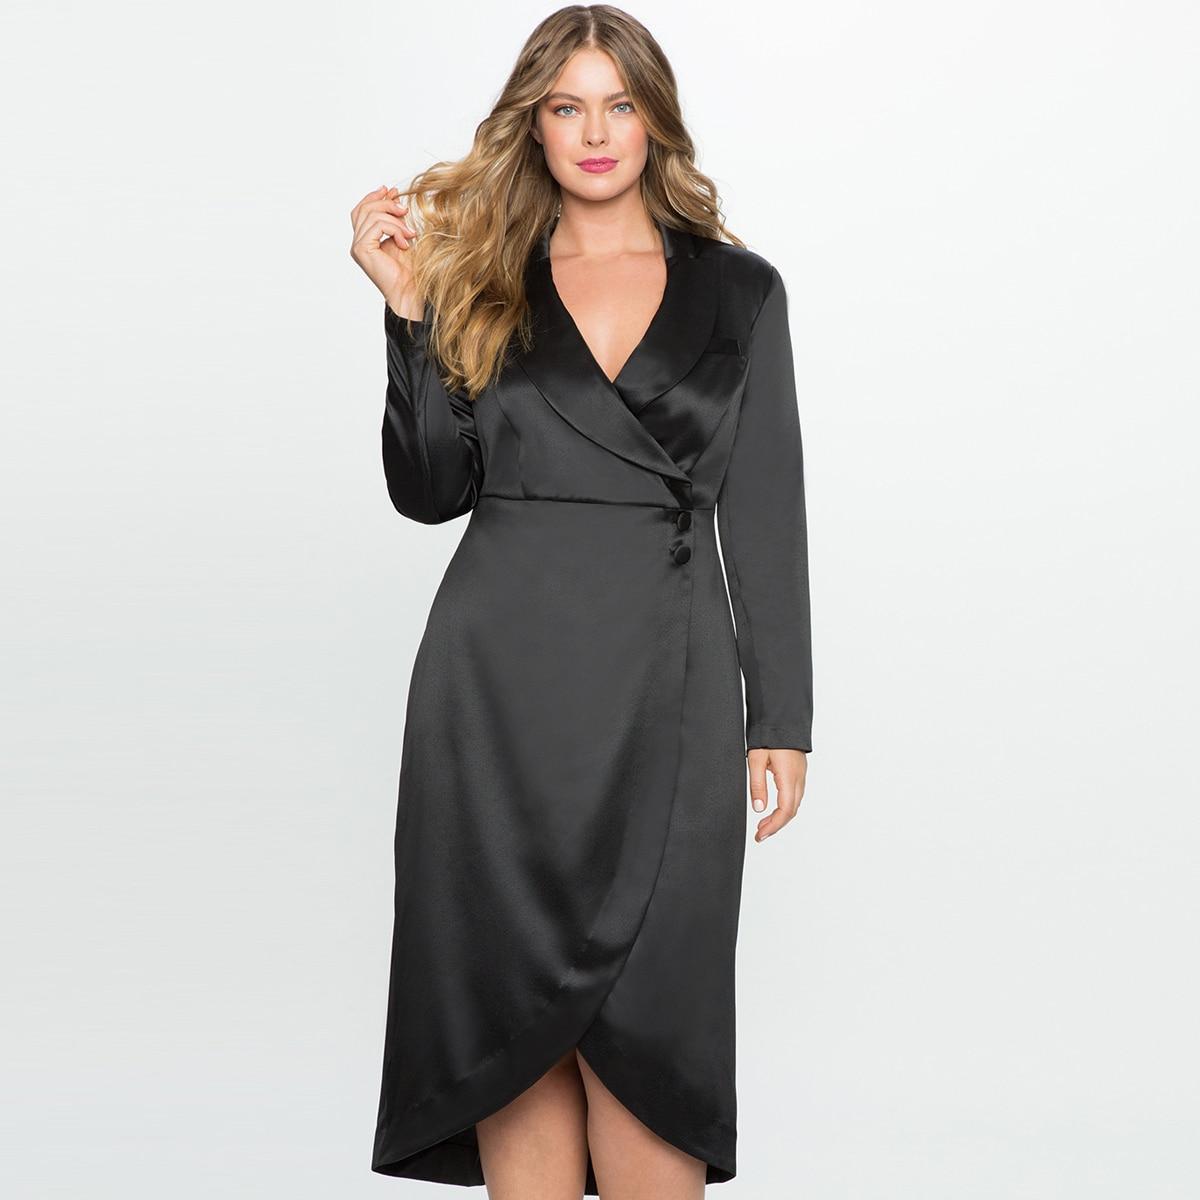 03b2c8c67ab MCO 2018 Tailored Office Ladies Plus Size Blazer Dress Oversized Black Wrap  Midi Dresses Basic Big OL Women Clothes 3XL 7XL-in Dresses from Women s  Clothing ...